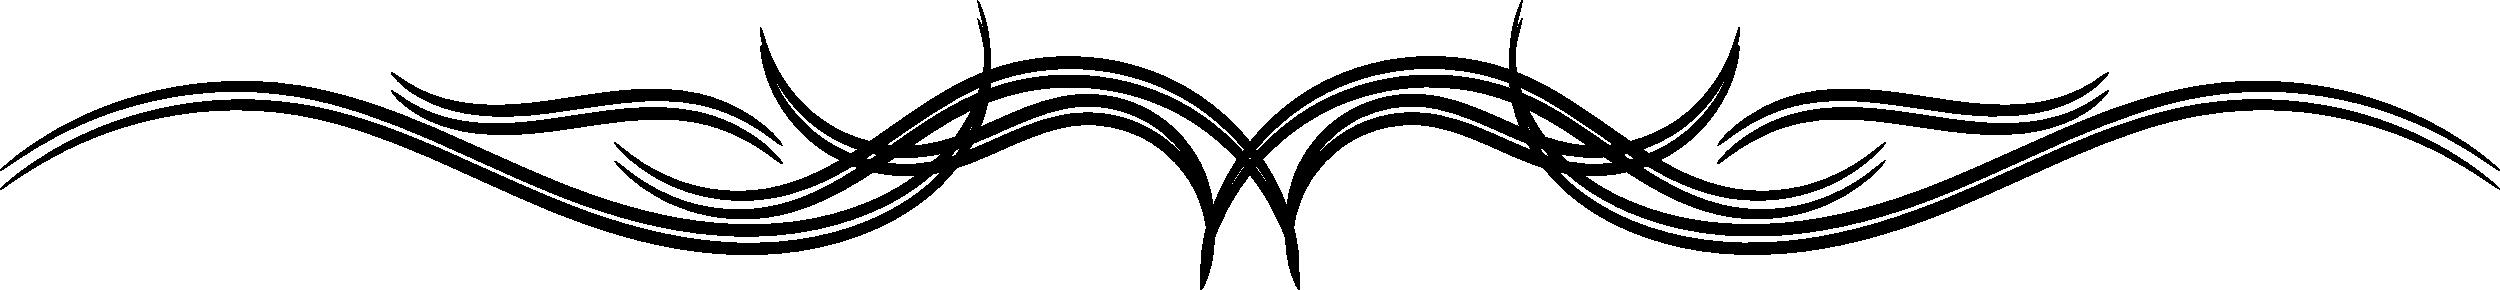 calligraphic elements page. Divider clipart design line